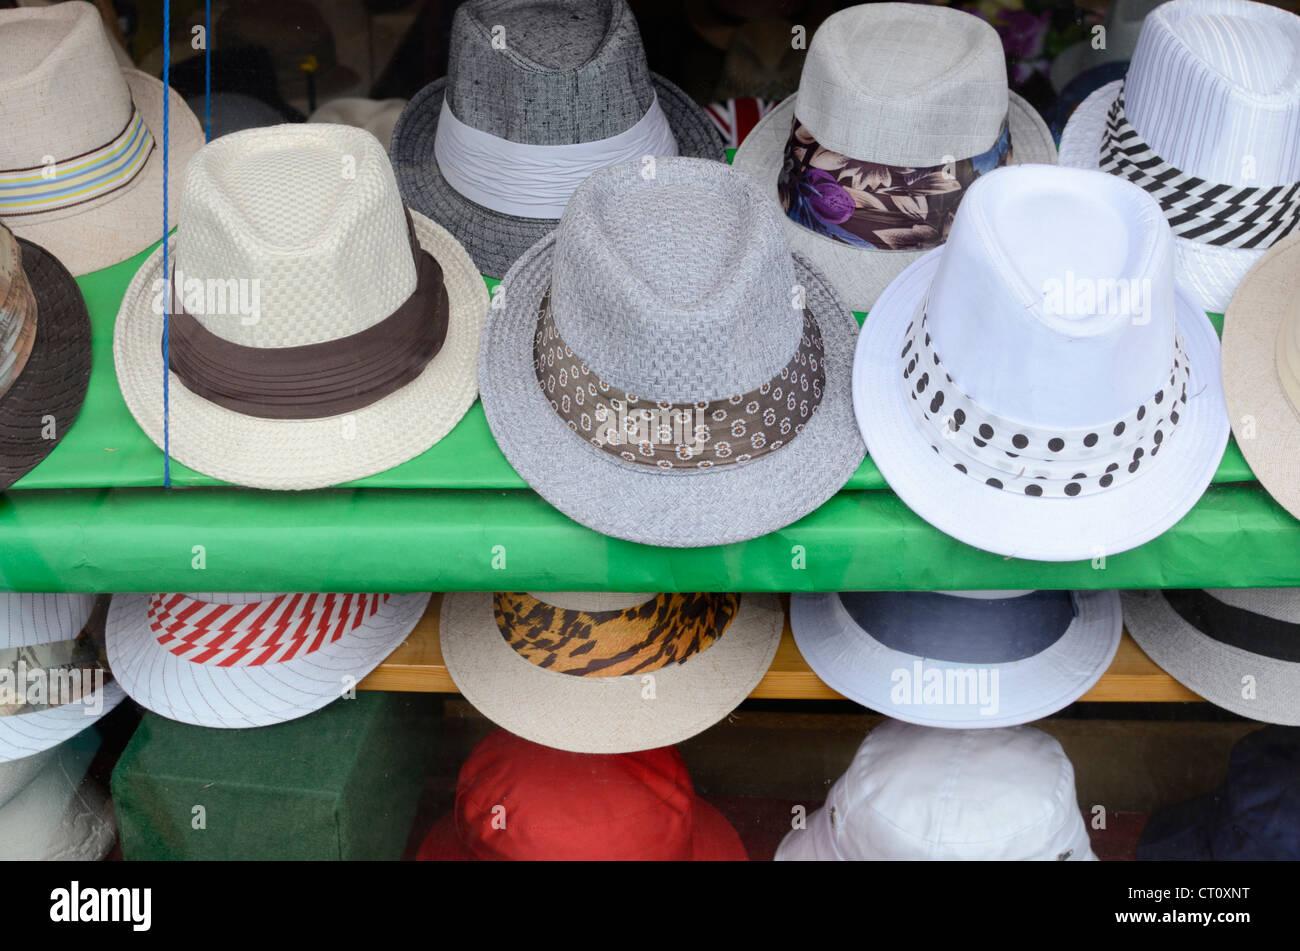 c1caf5bcc46c86 Trilby hats in a UK shop window · Roberto Herrett / Alamy Stock Photo